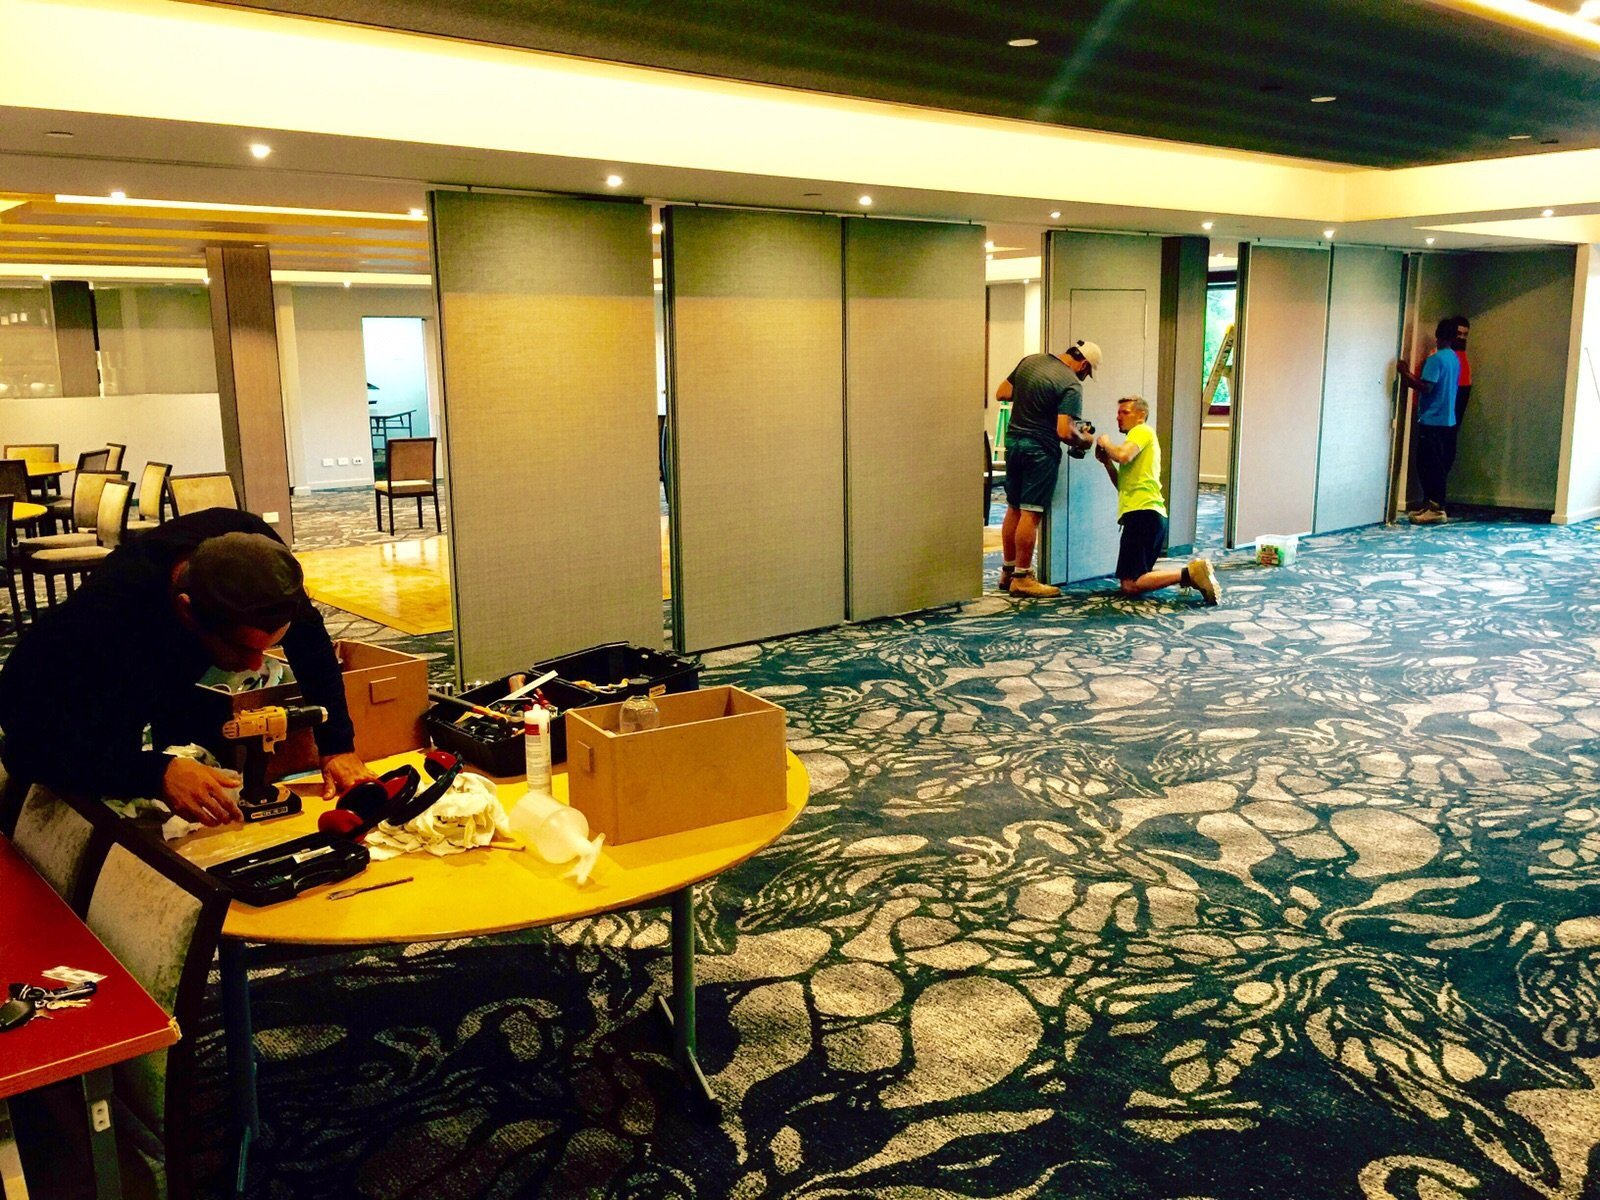 China Acoustic Movable Walls for Ballroom